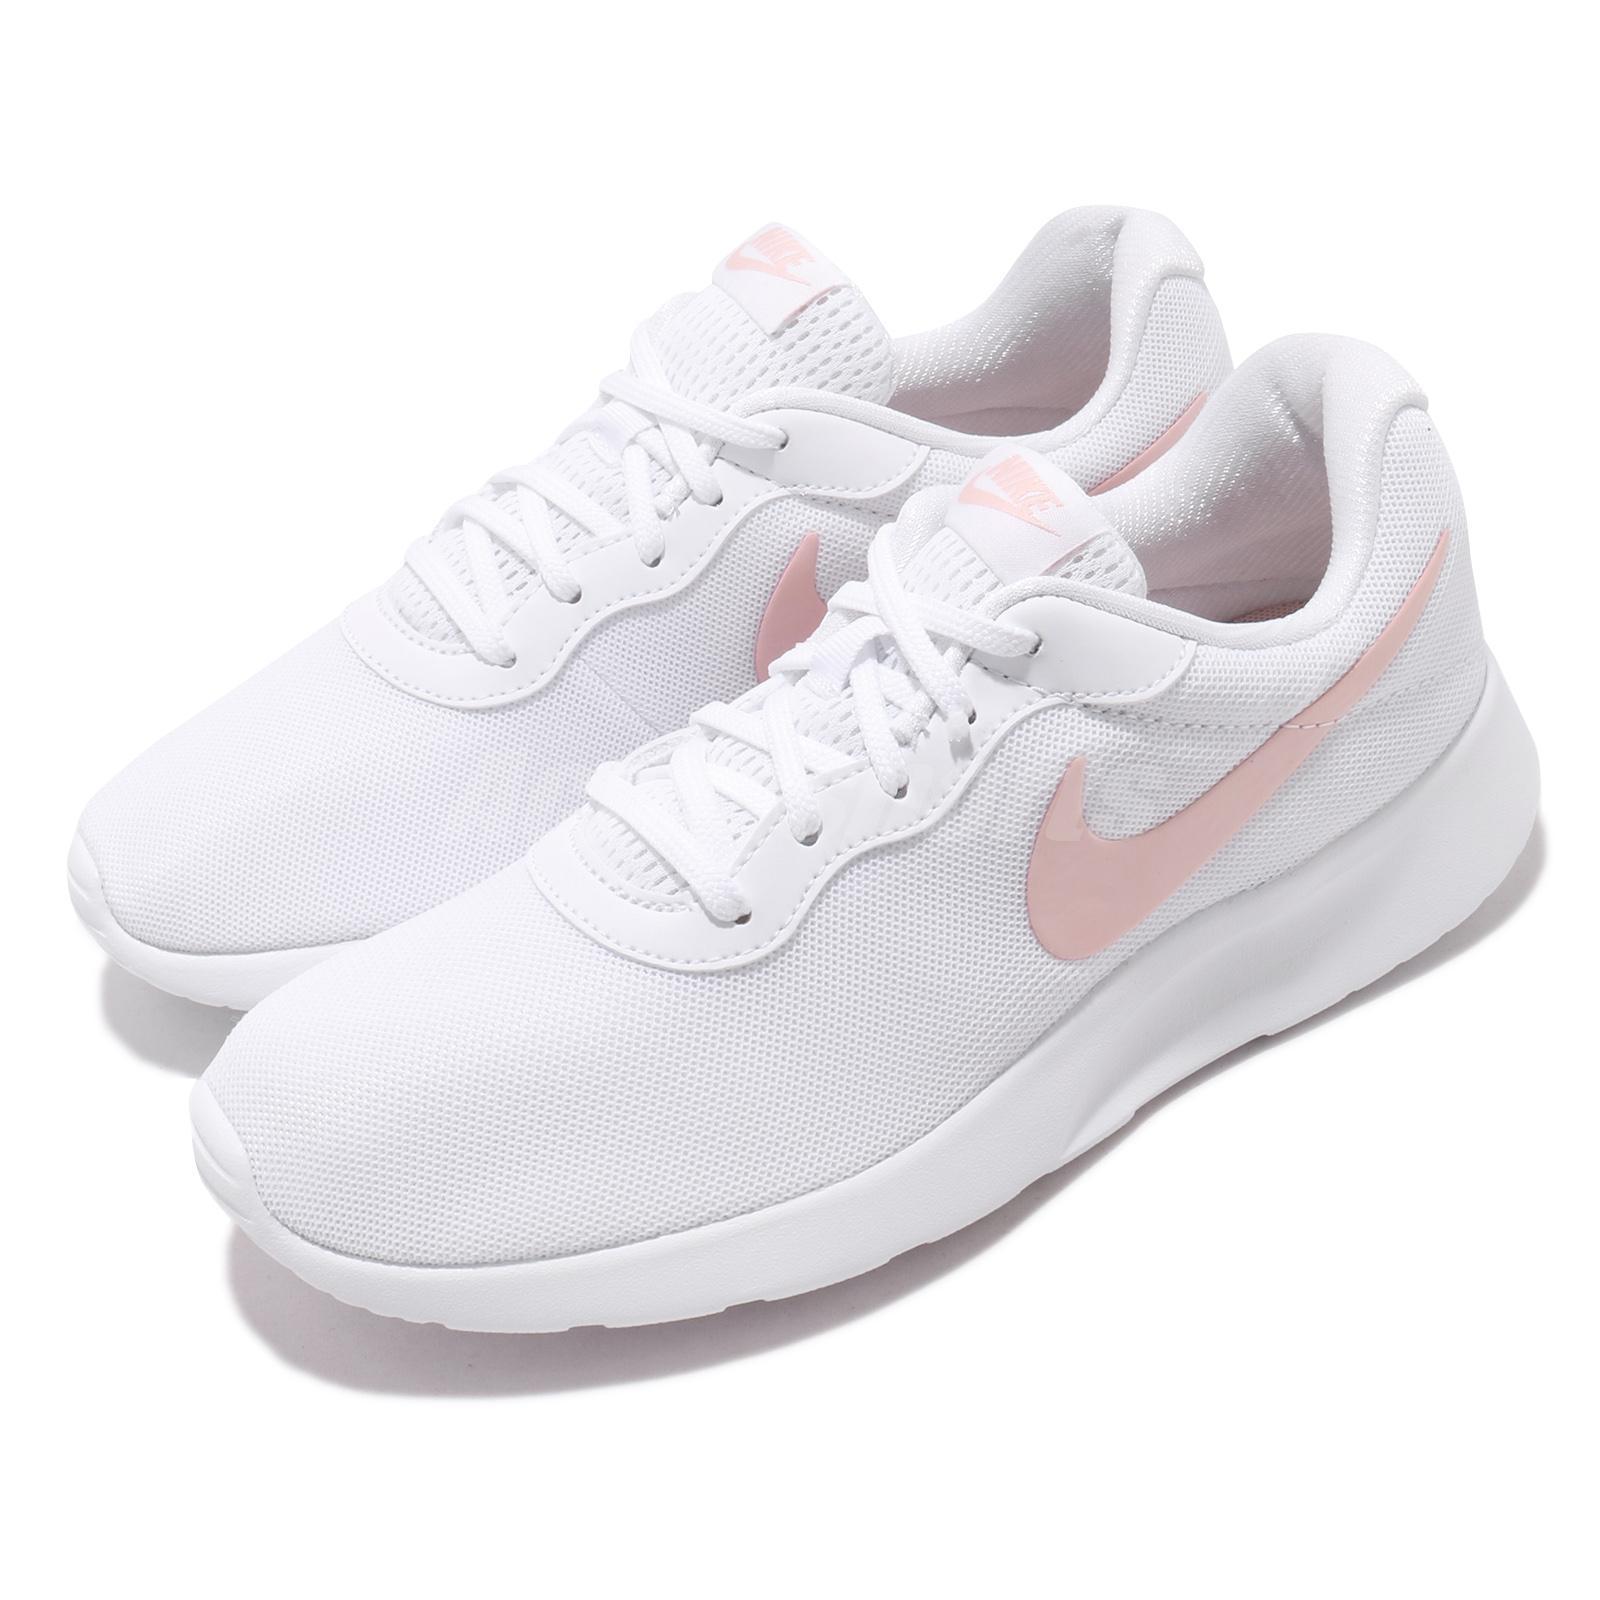 Nike Wmns Tanjun White Washed Coral